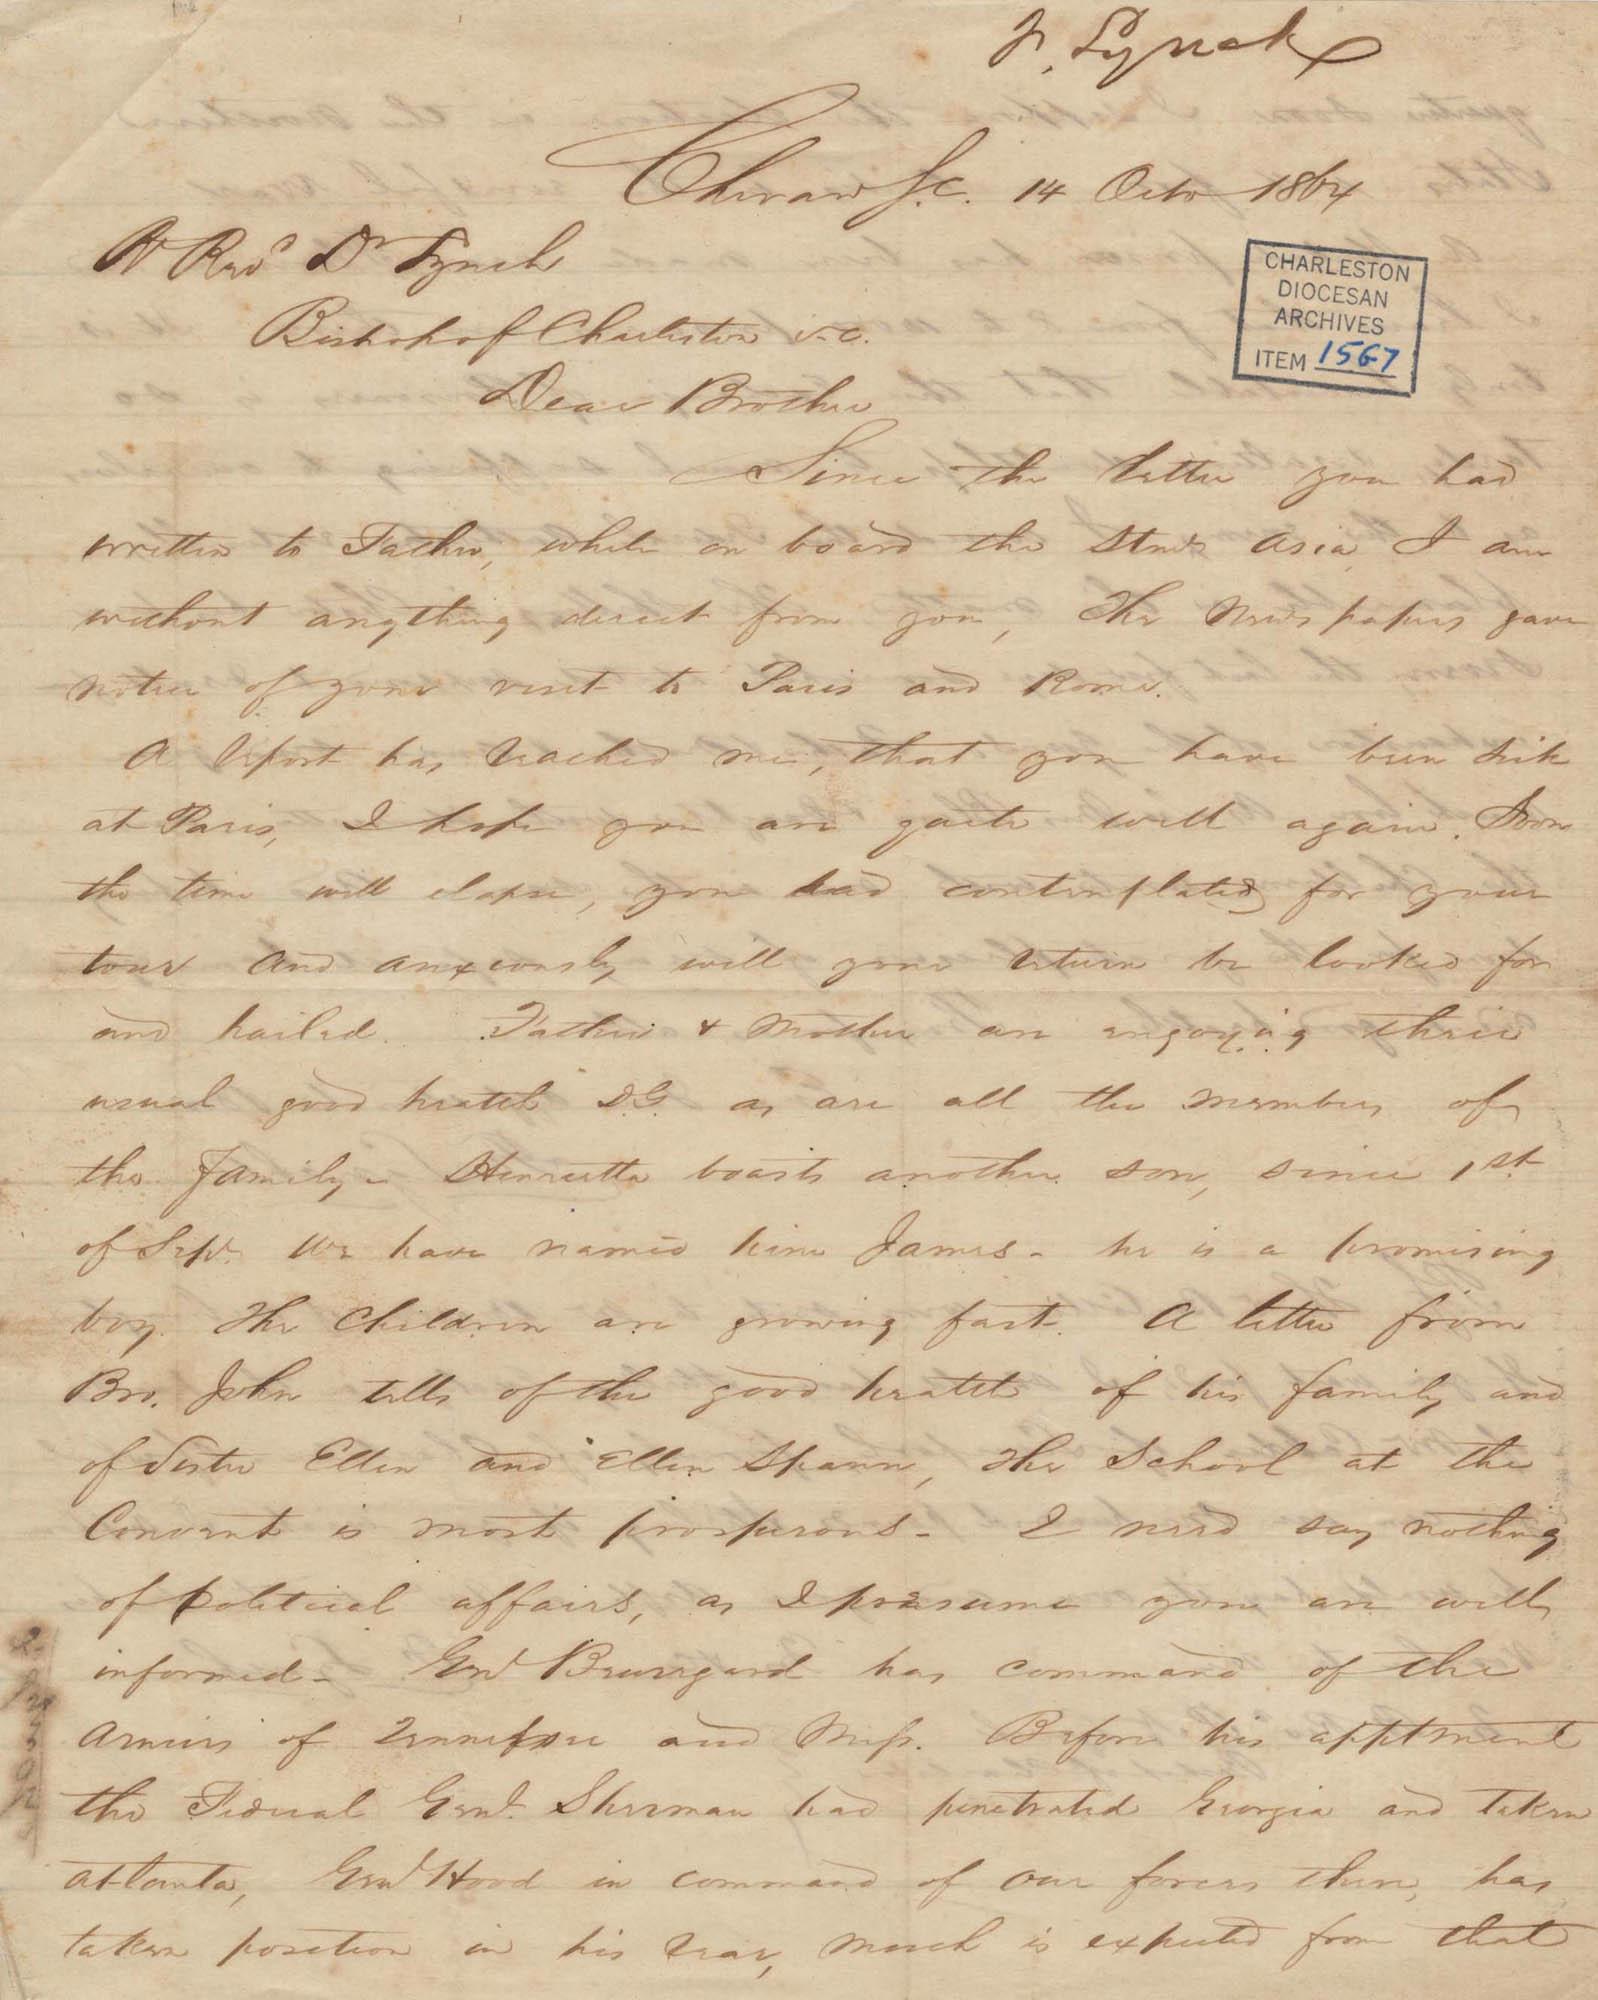 359. Francis Lynch to Bp Patrick Lynch -- October 14, 1864